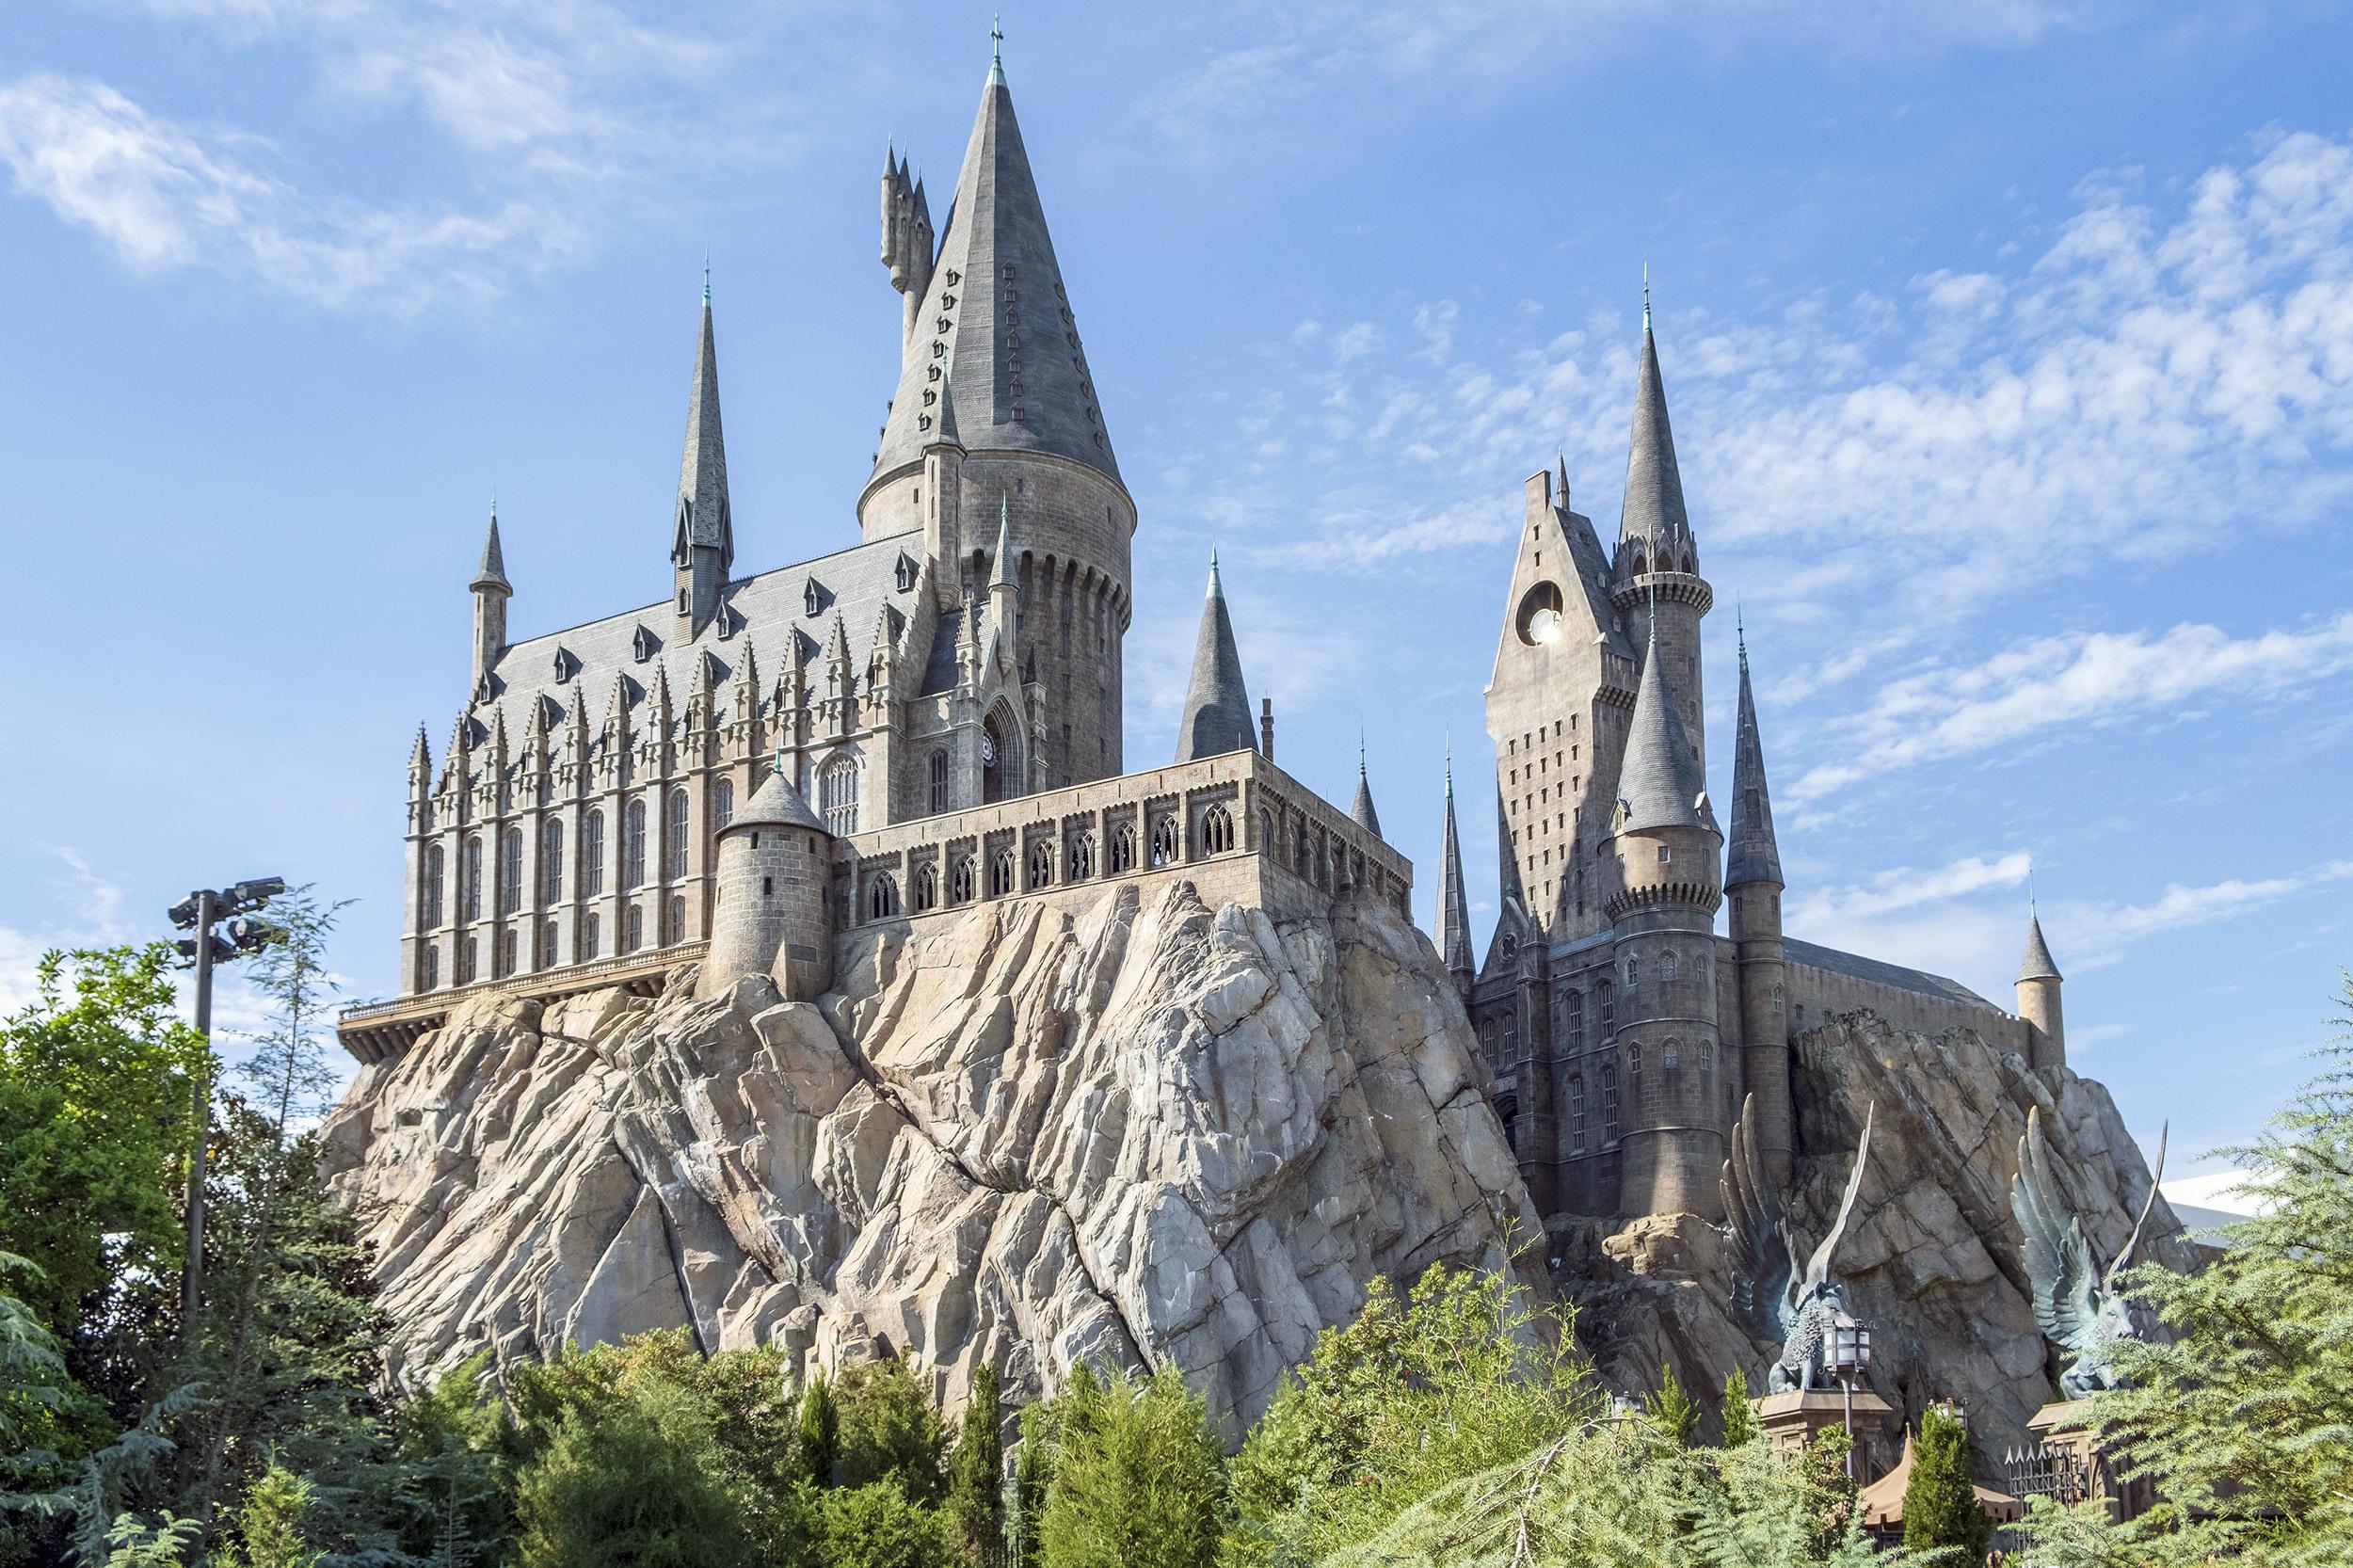 Hogwarts Castle The Wizarding World of Harry Potter Orlando